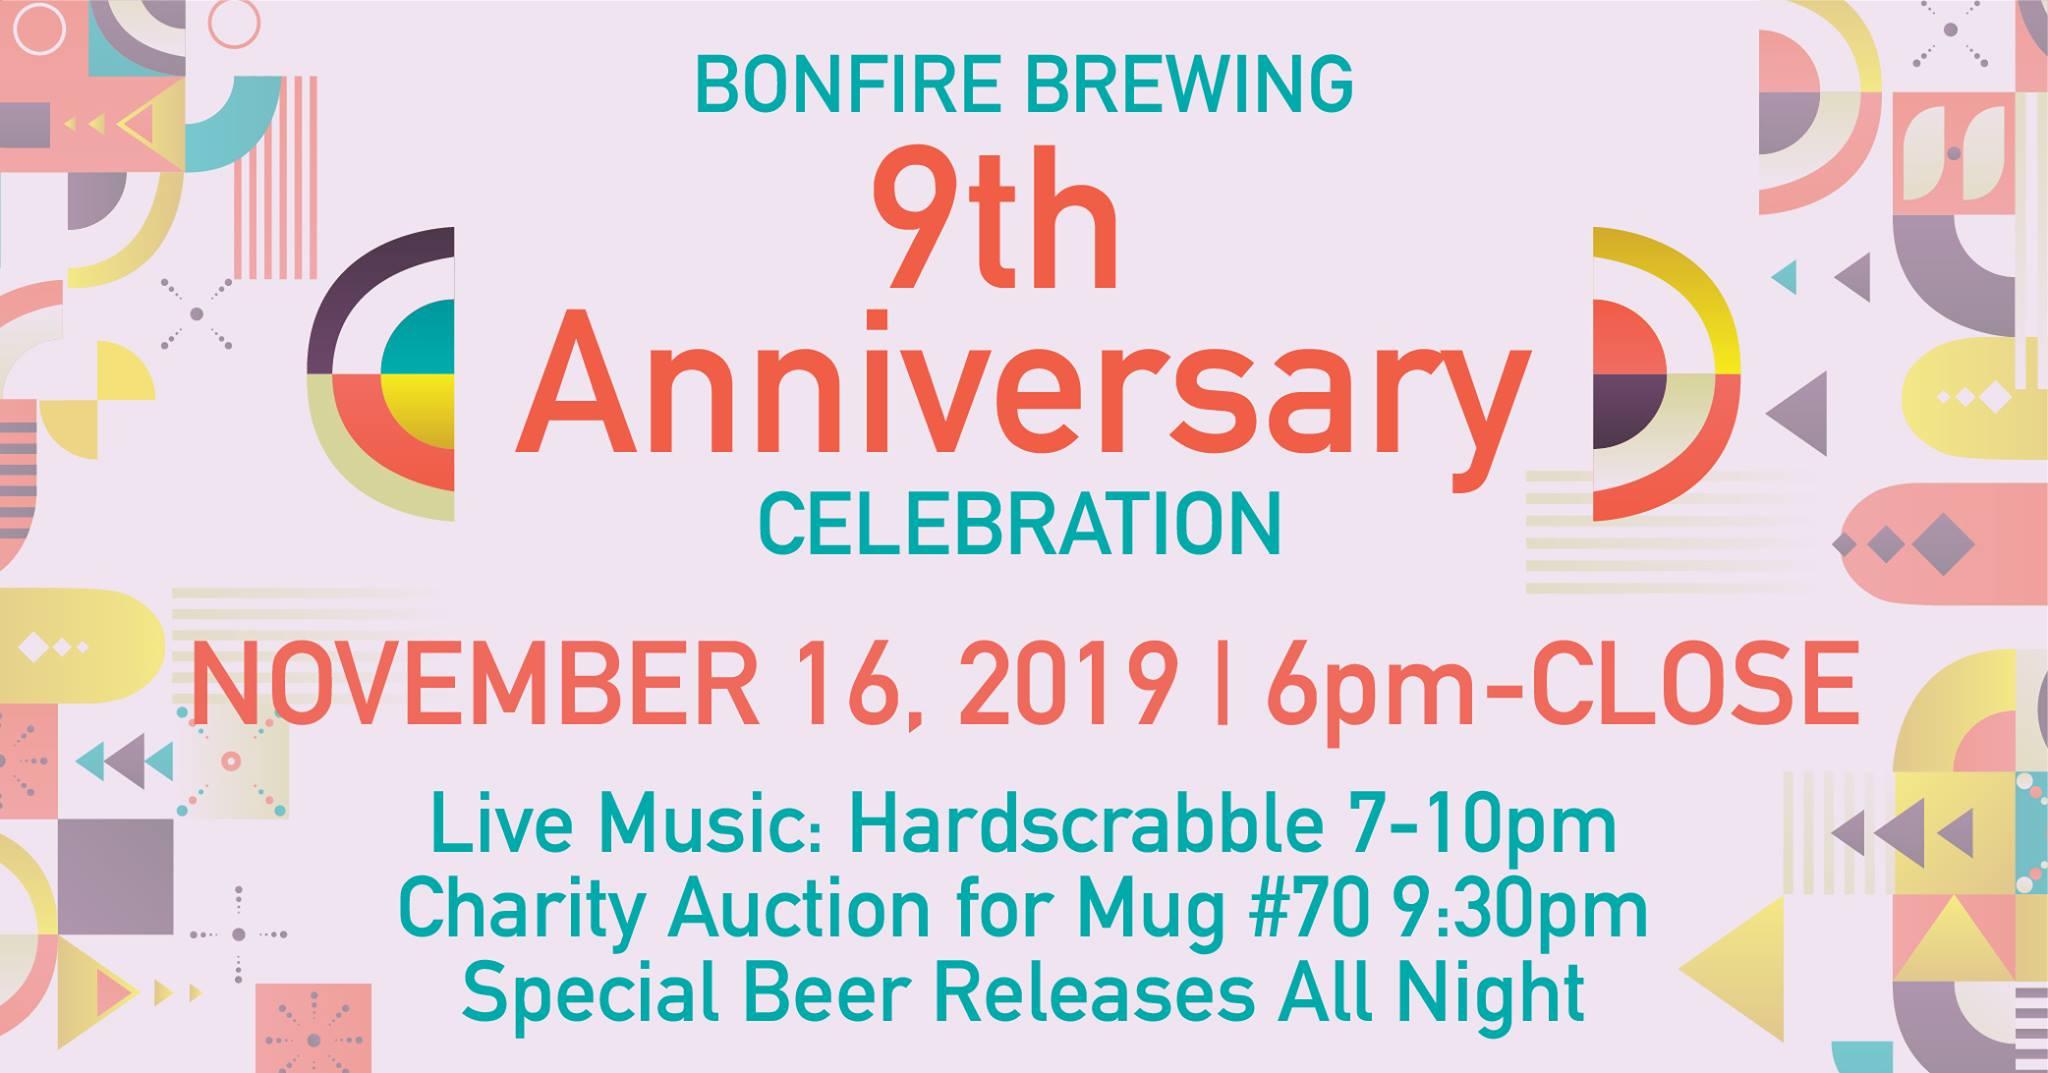 bonfire brewery 9th year anniversary